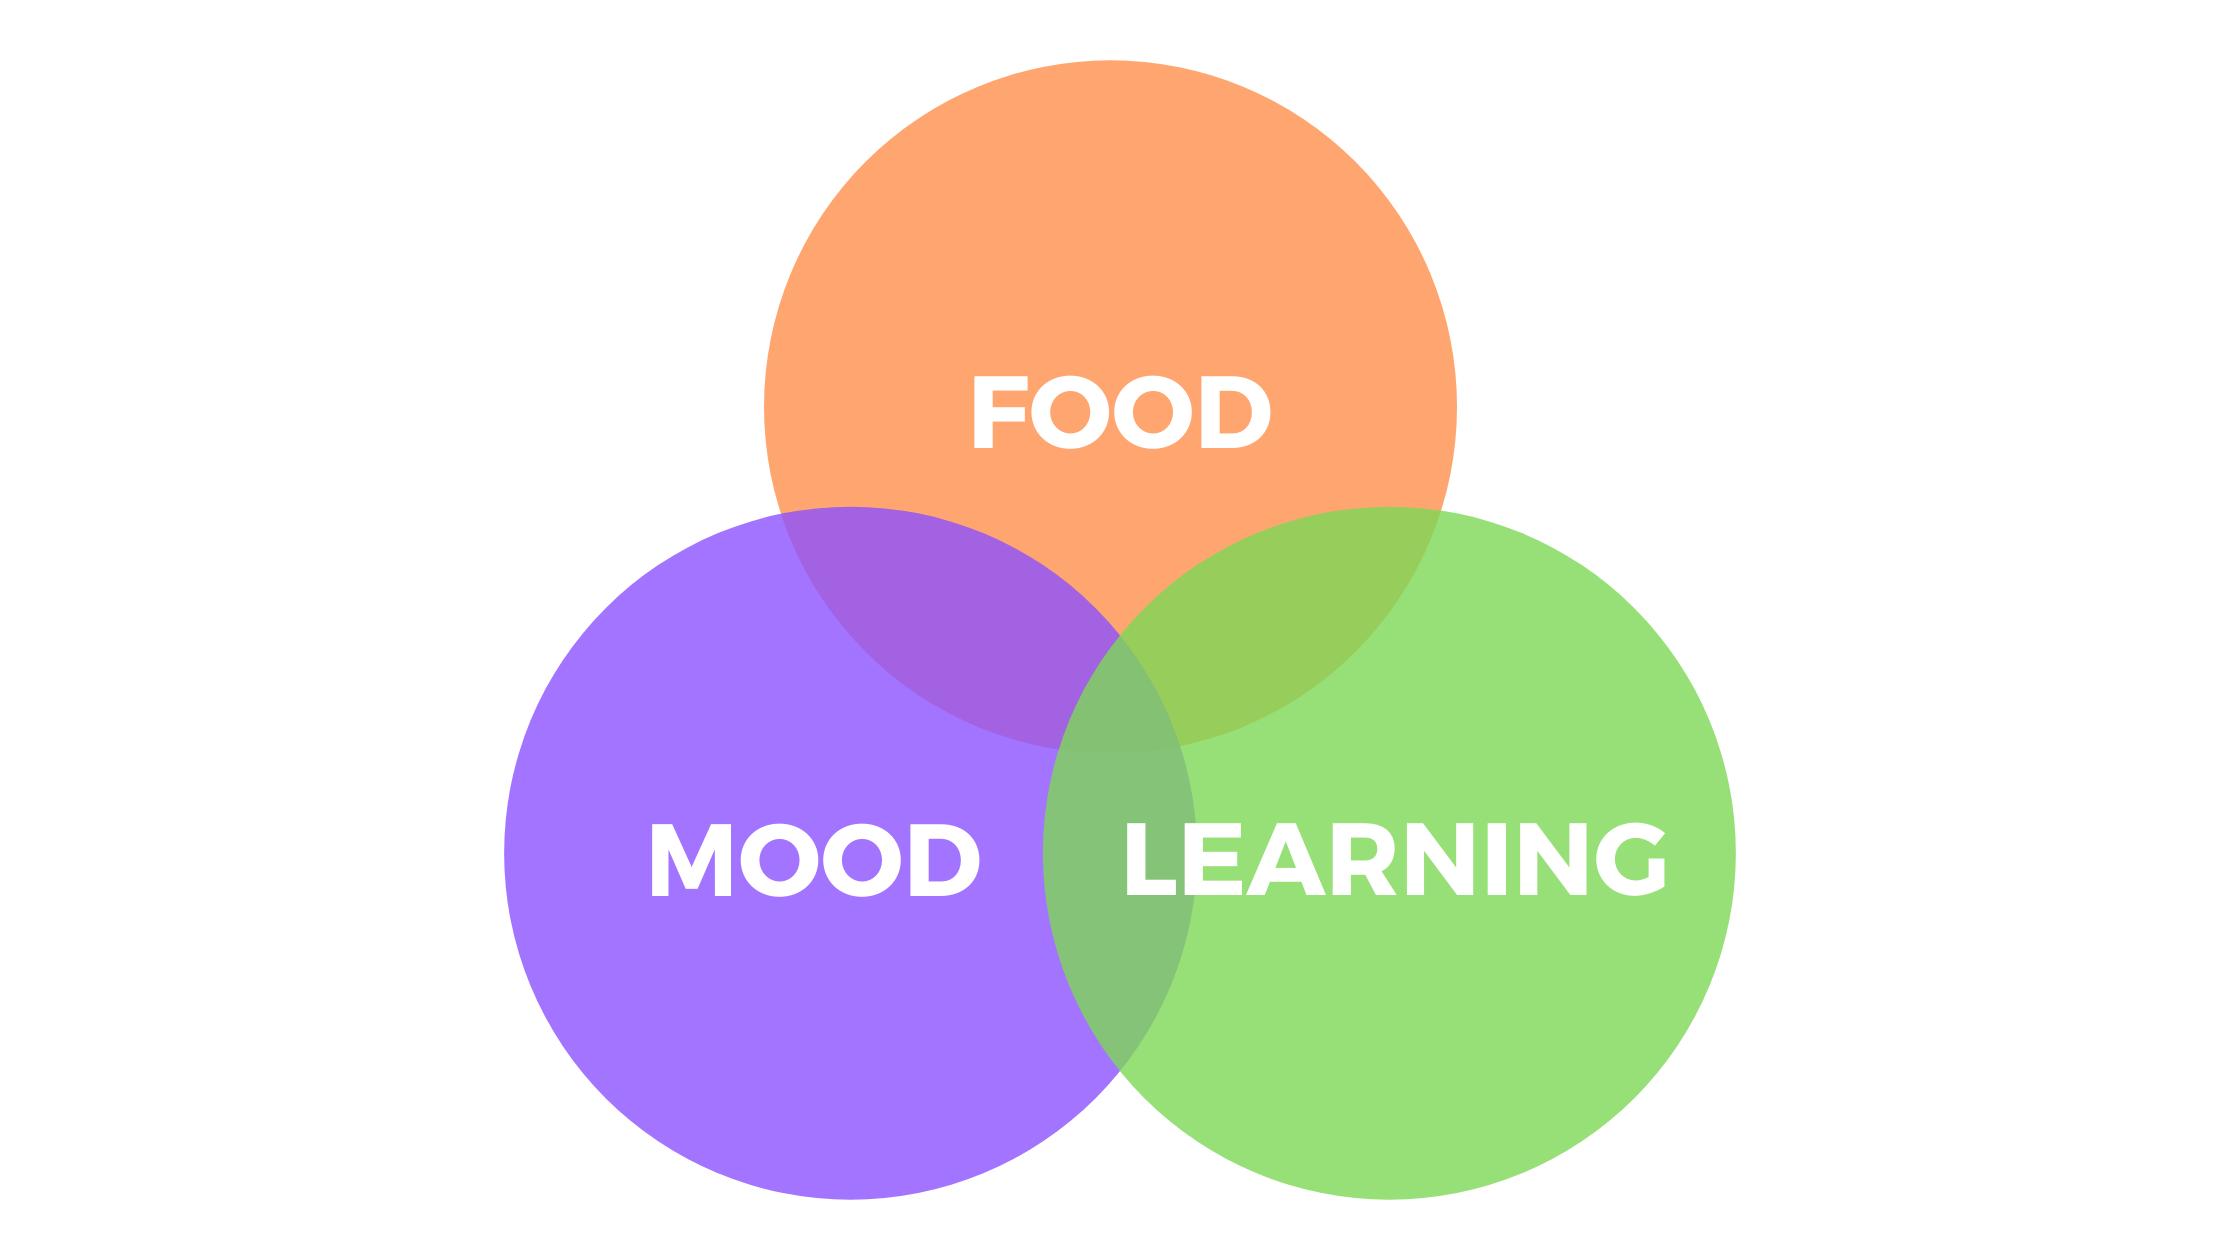 Food, mood and learning van diagram